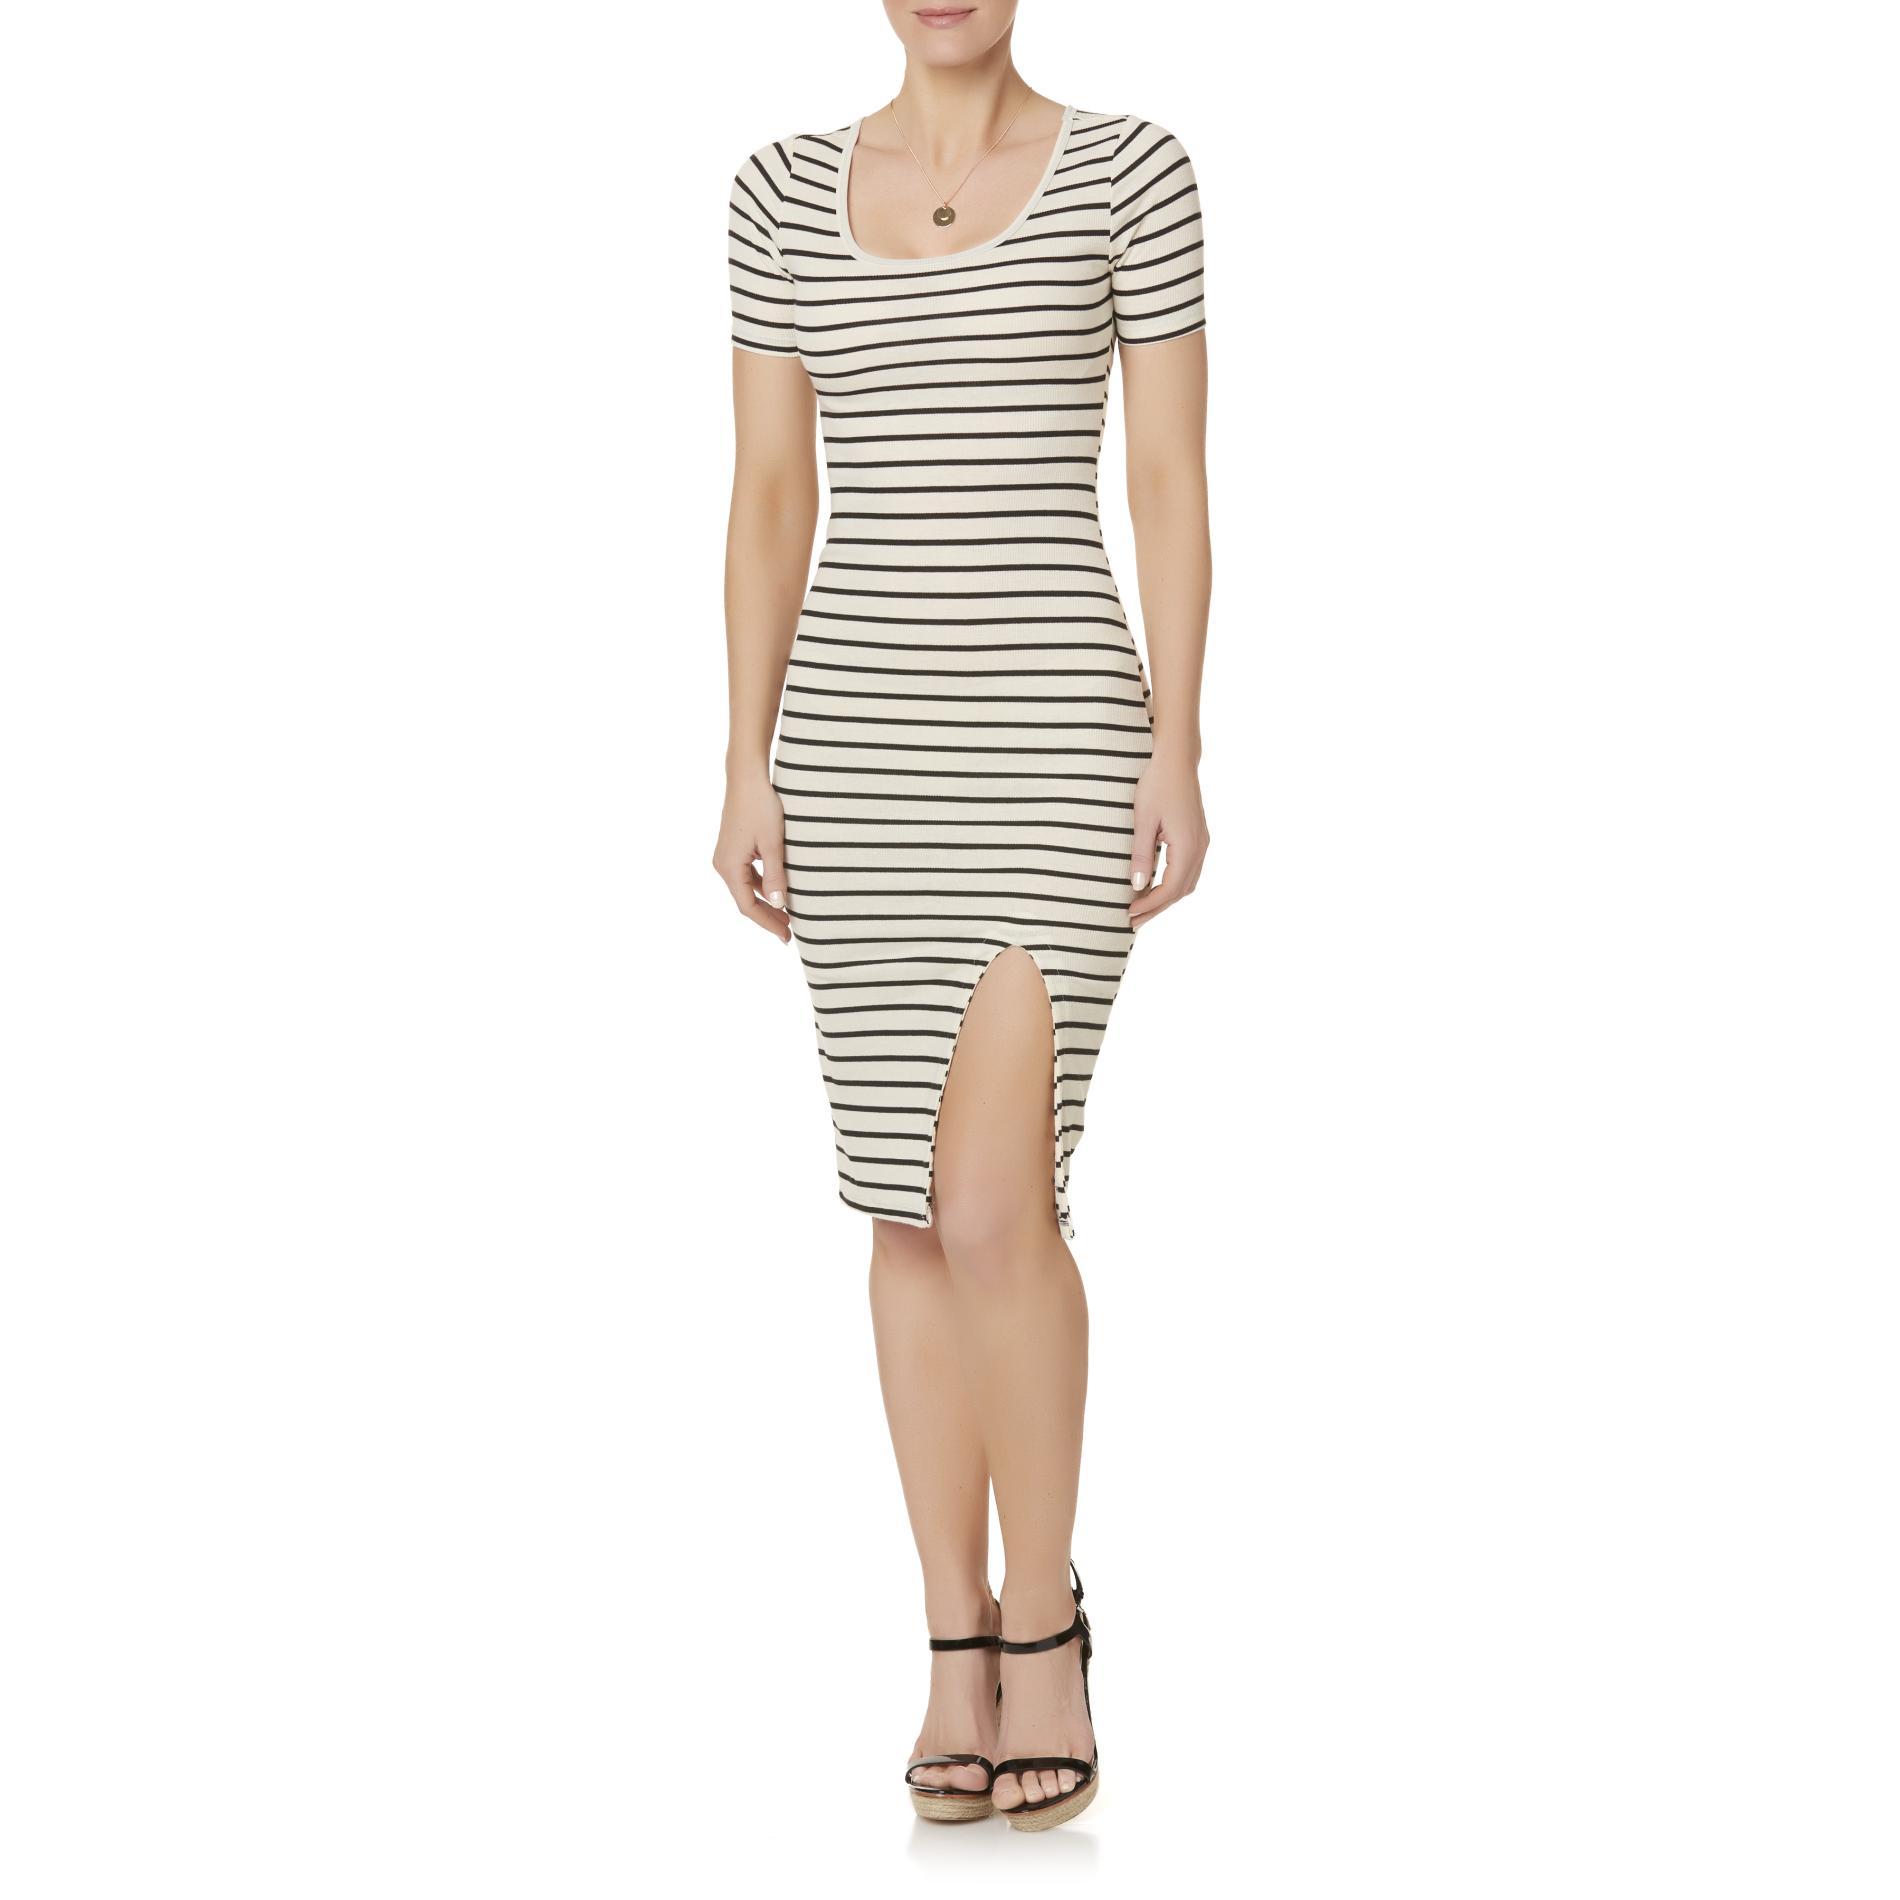 Attention Women's Rib Knit Midi Dress - Striped PartNumber: 027VA95305712P MfgPartNumber: 5P68-2